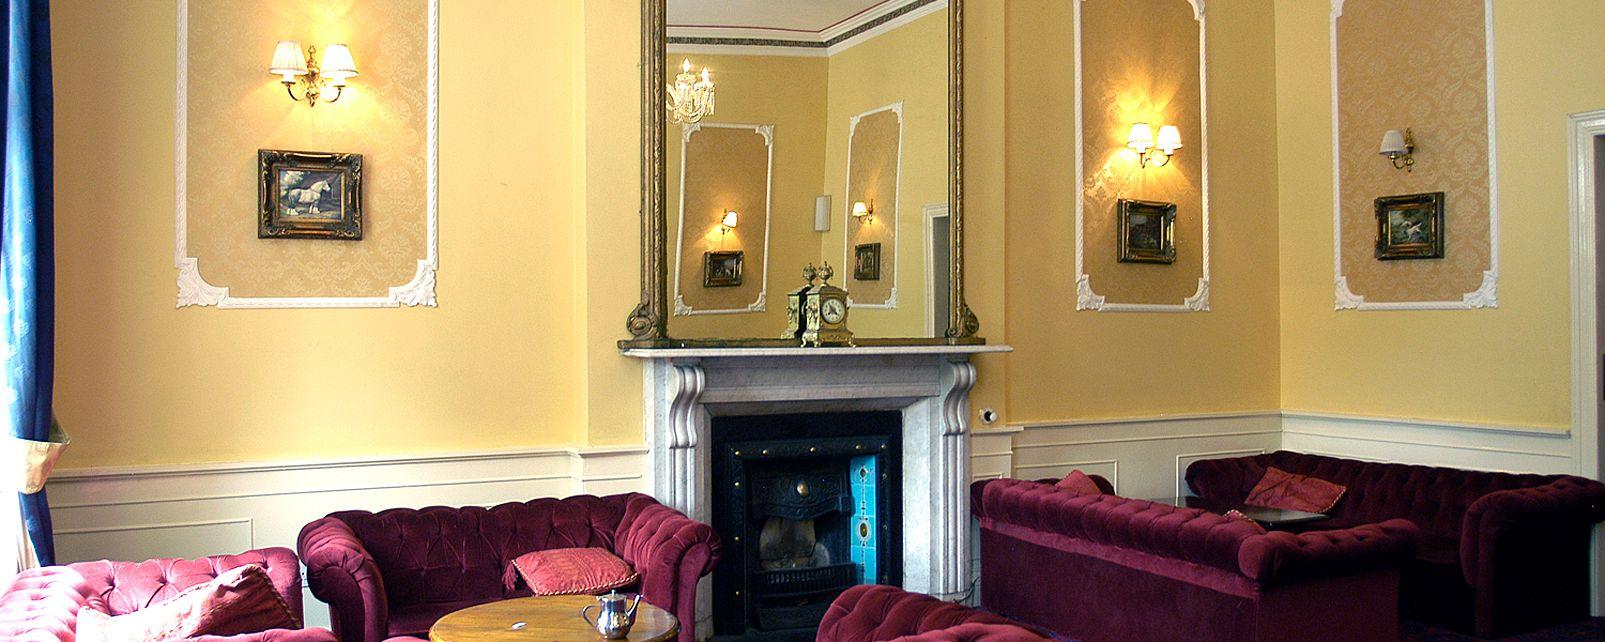 Hotel St. George Hotel Dublin